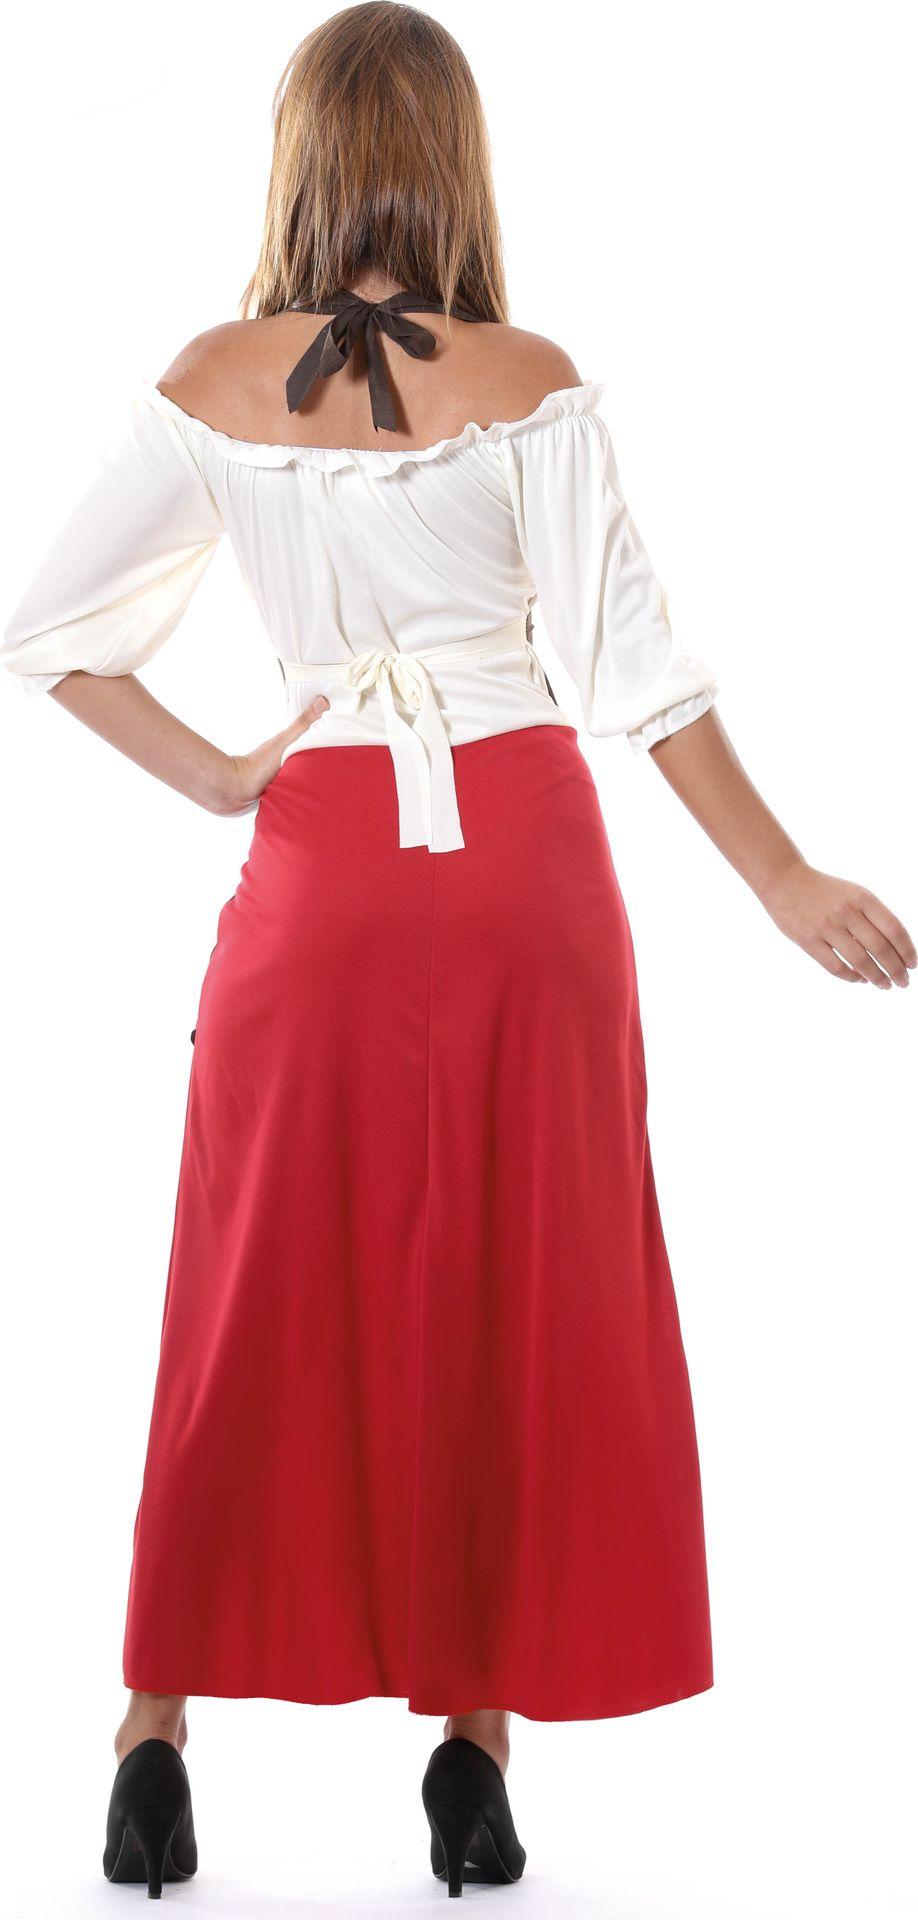 Middeleeuwse lange jurk